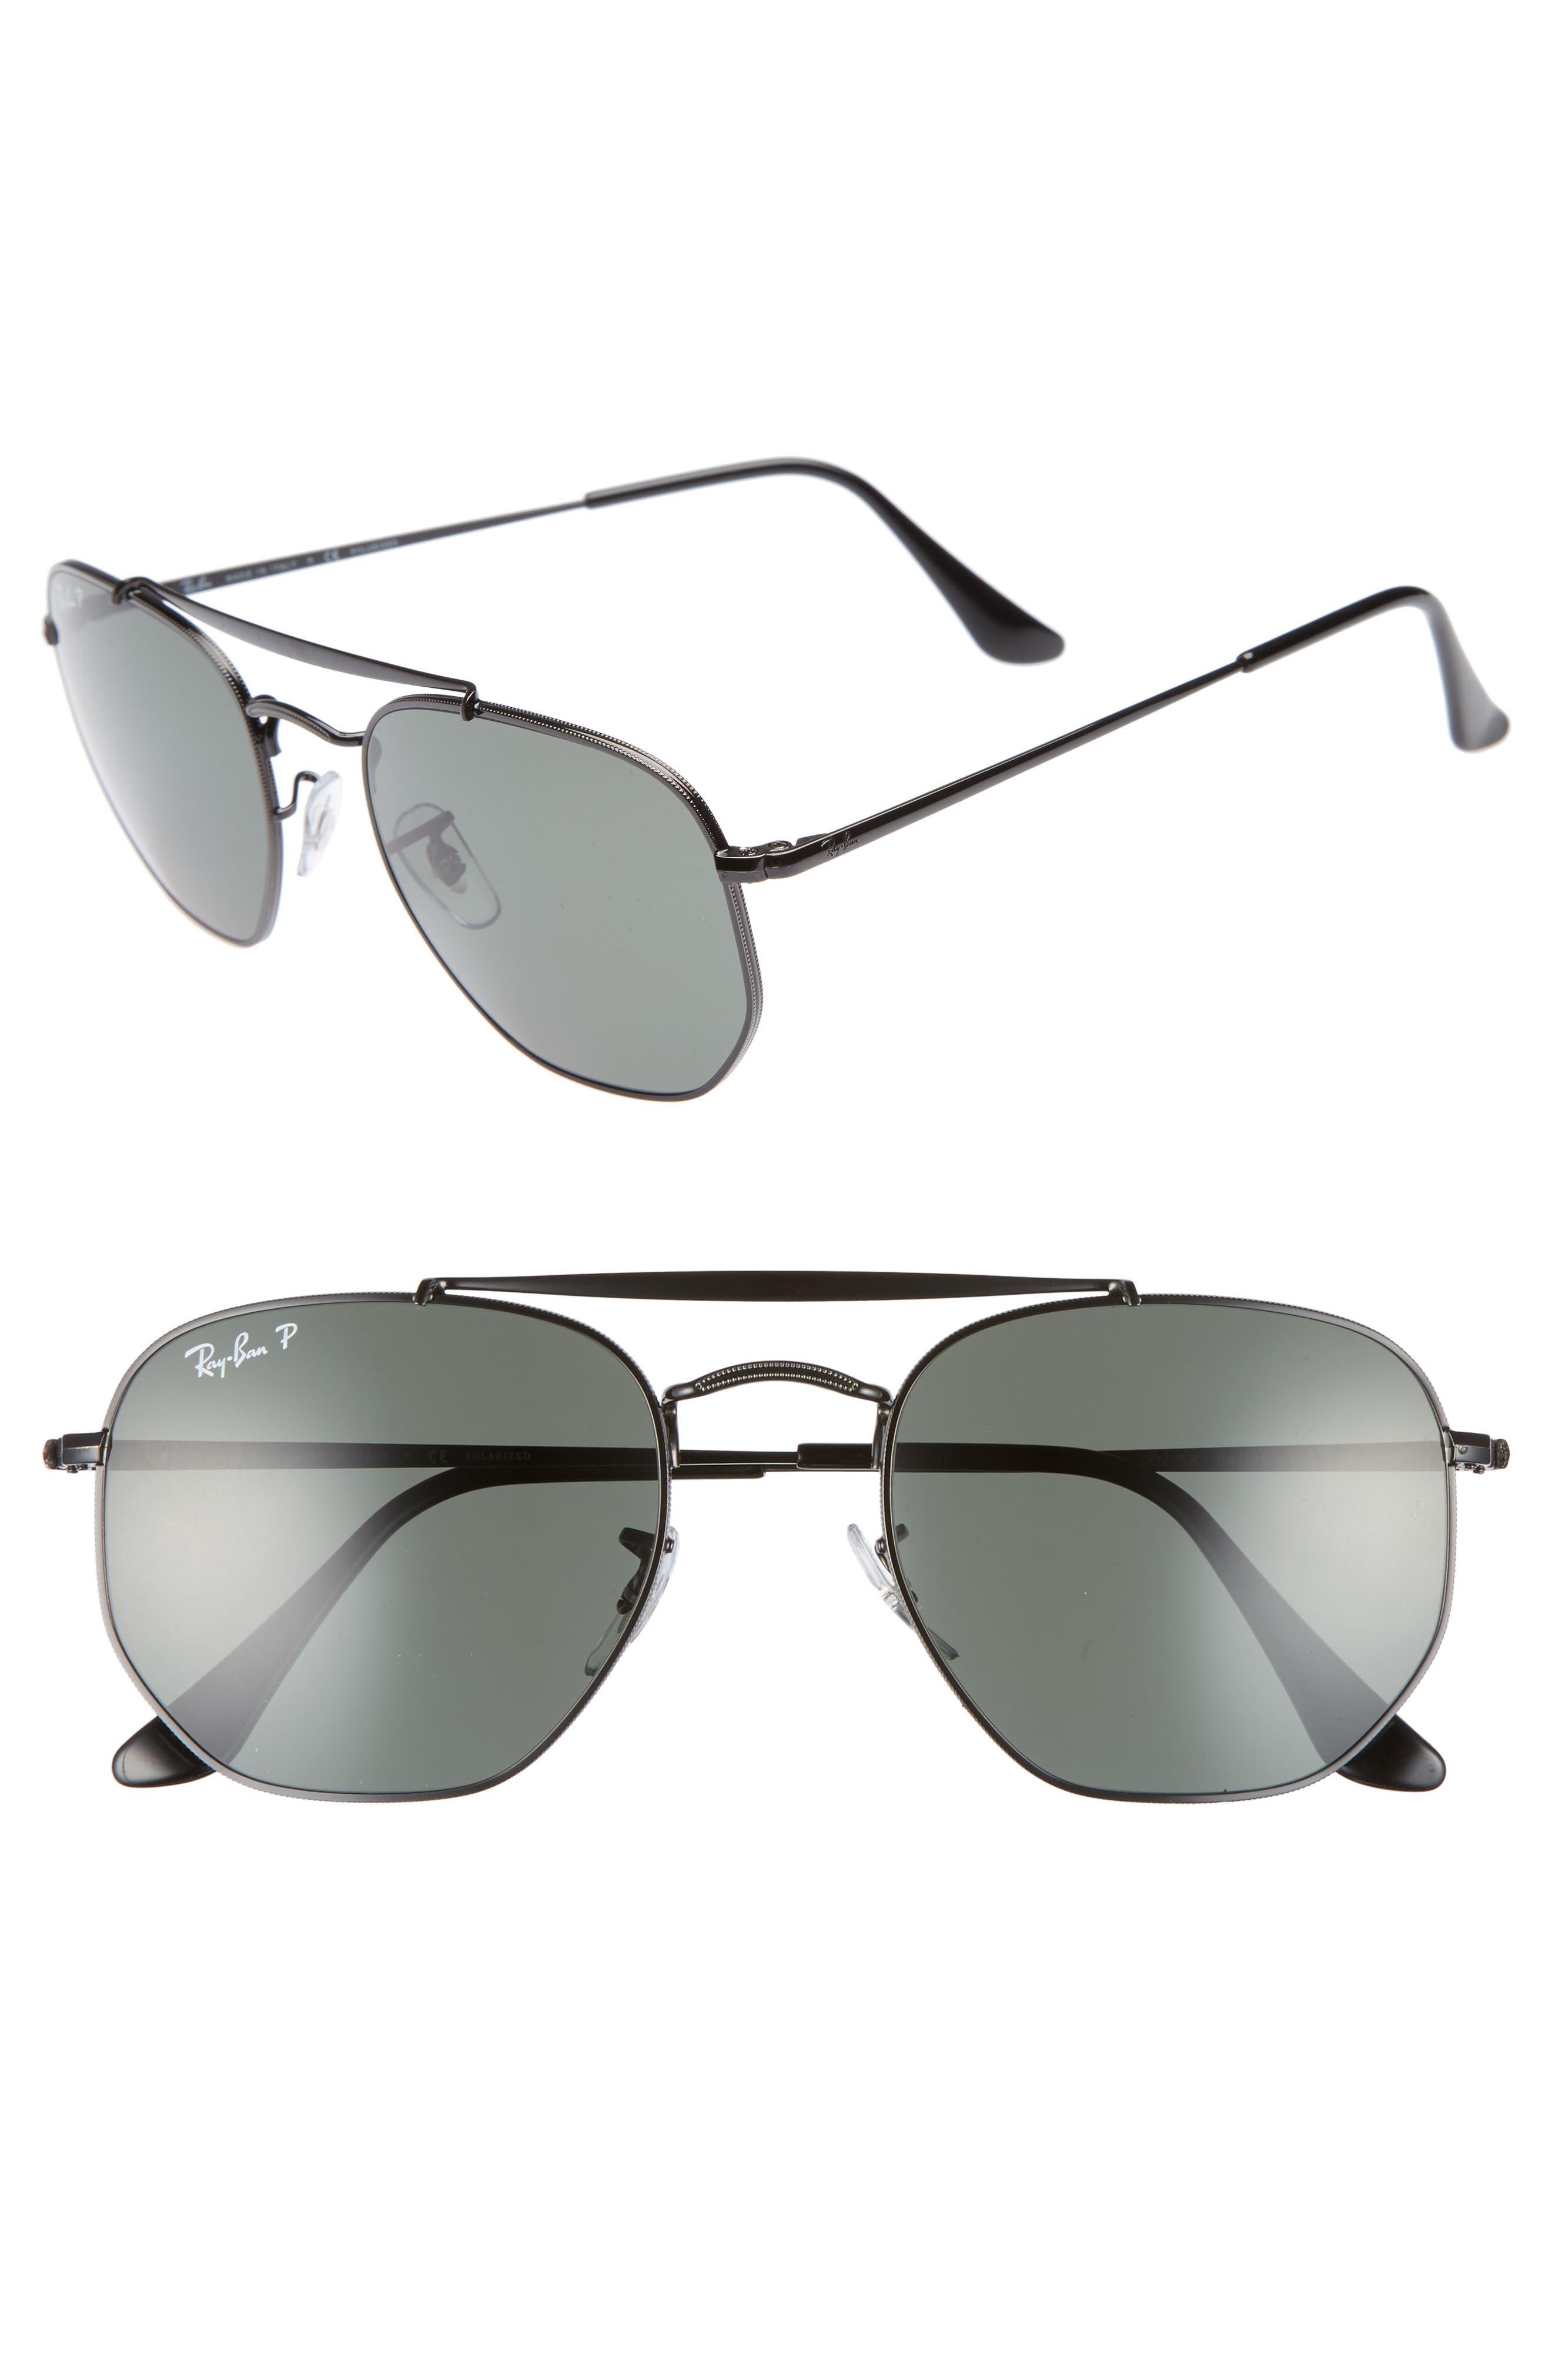 Marshal 54mm Polarized Aviator Sunglasses,                             Main thumbnail 1, color,                             Black Polarized